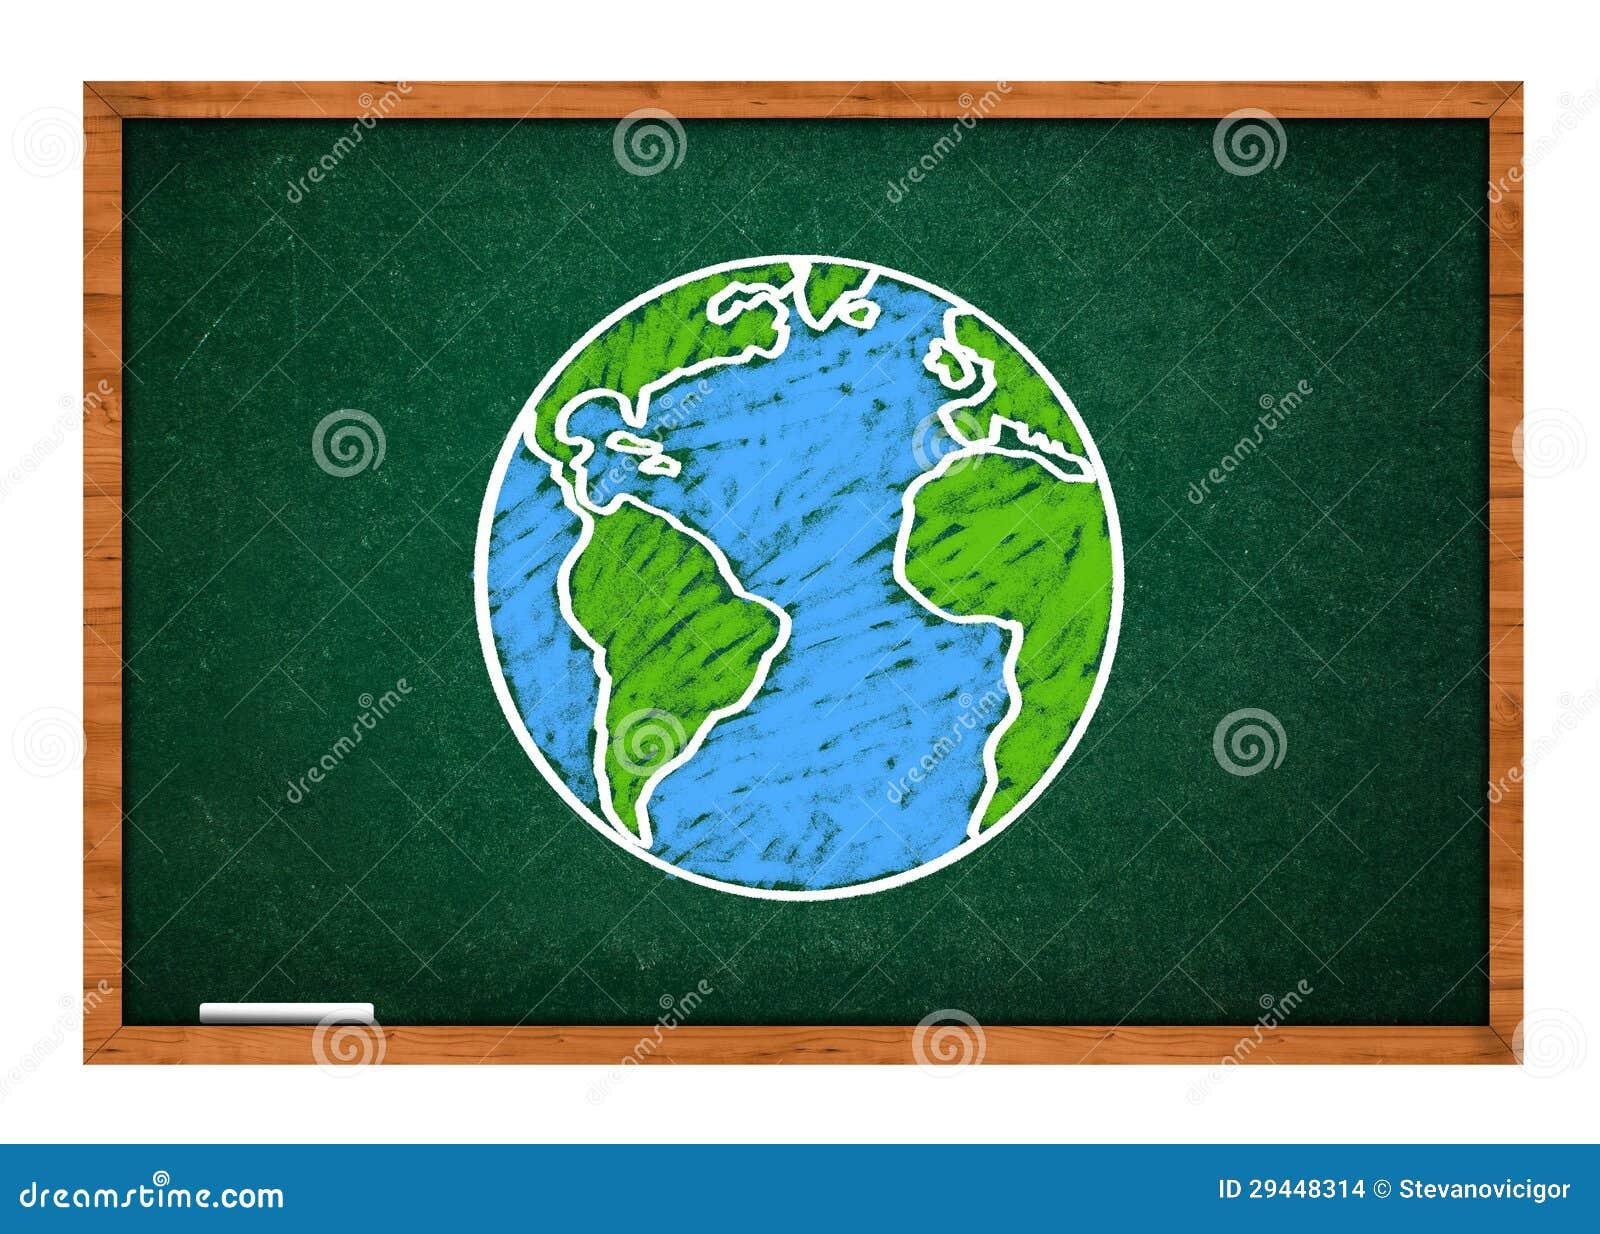 earth on green school chalkboard stock images